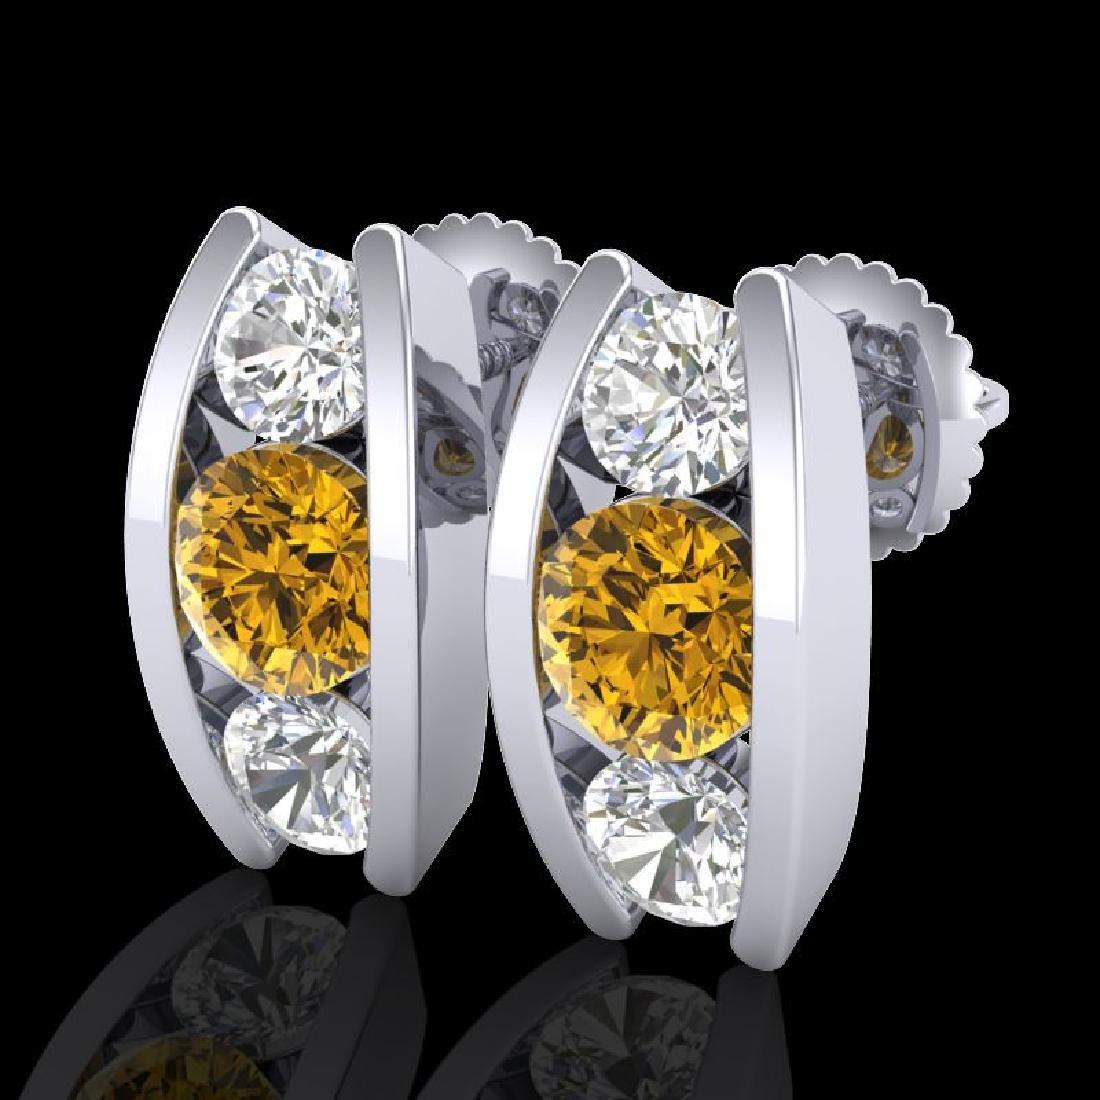 2.18 CTW Intense Fancy Yellow Diamond Art Deco Stud